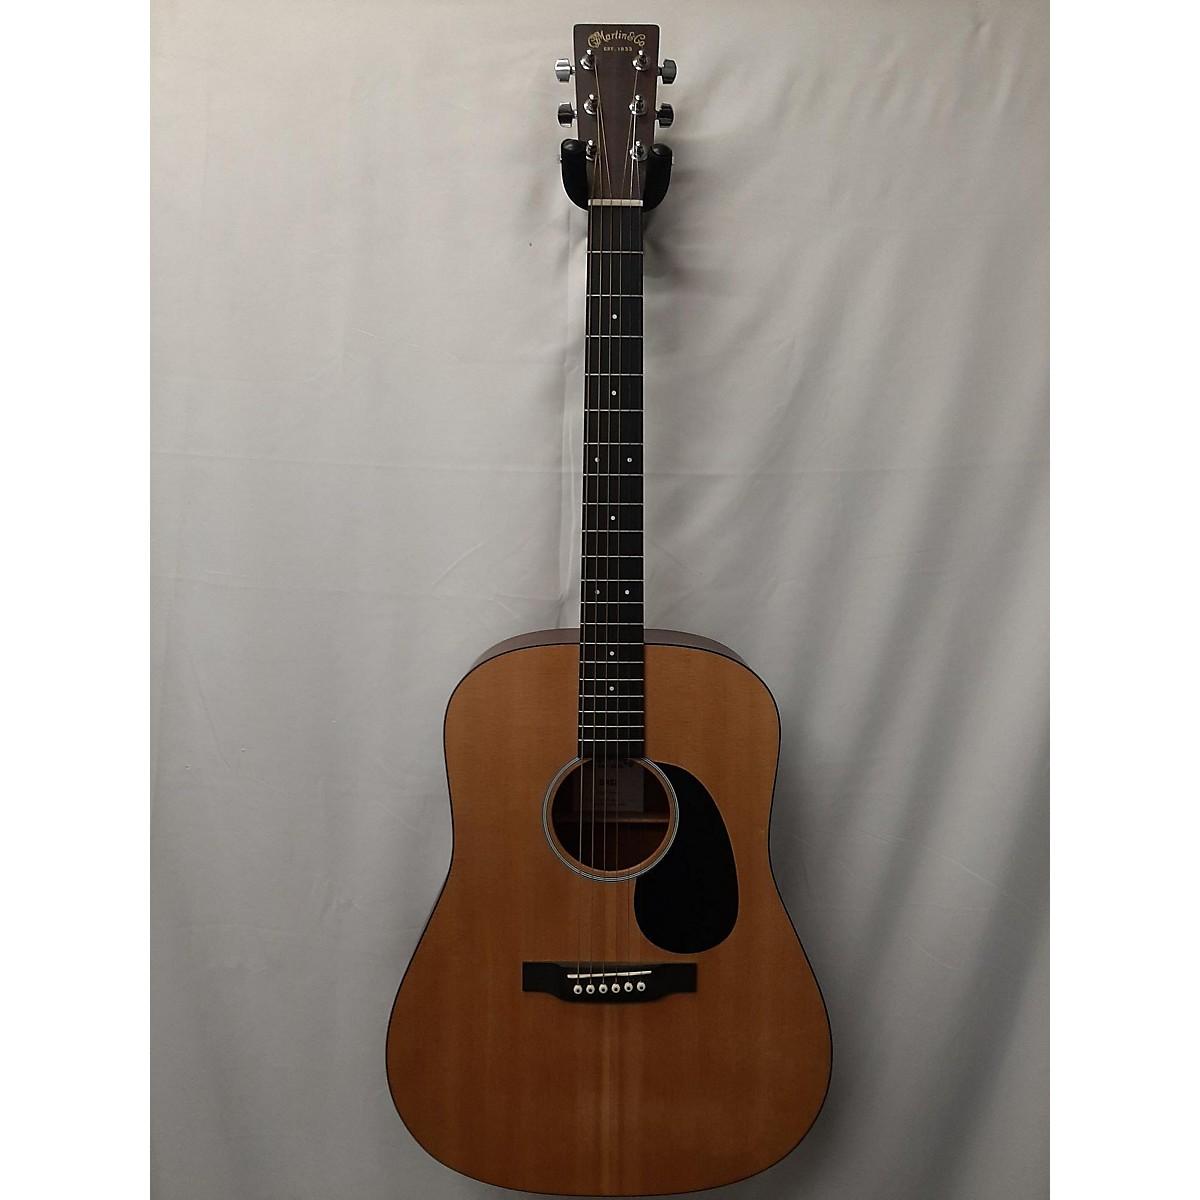 Martin 2015 DRS2 Acoustic Electric Guitar